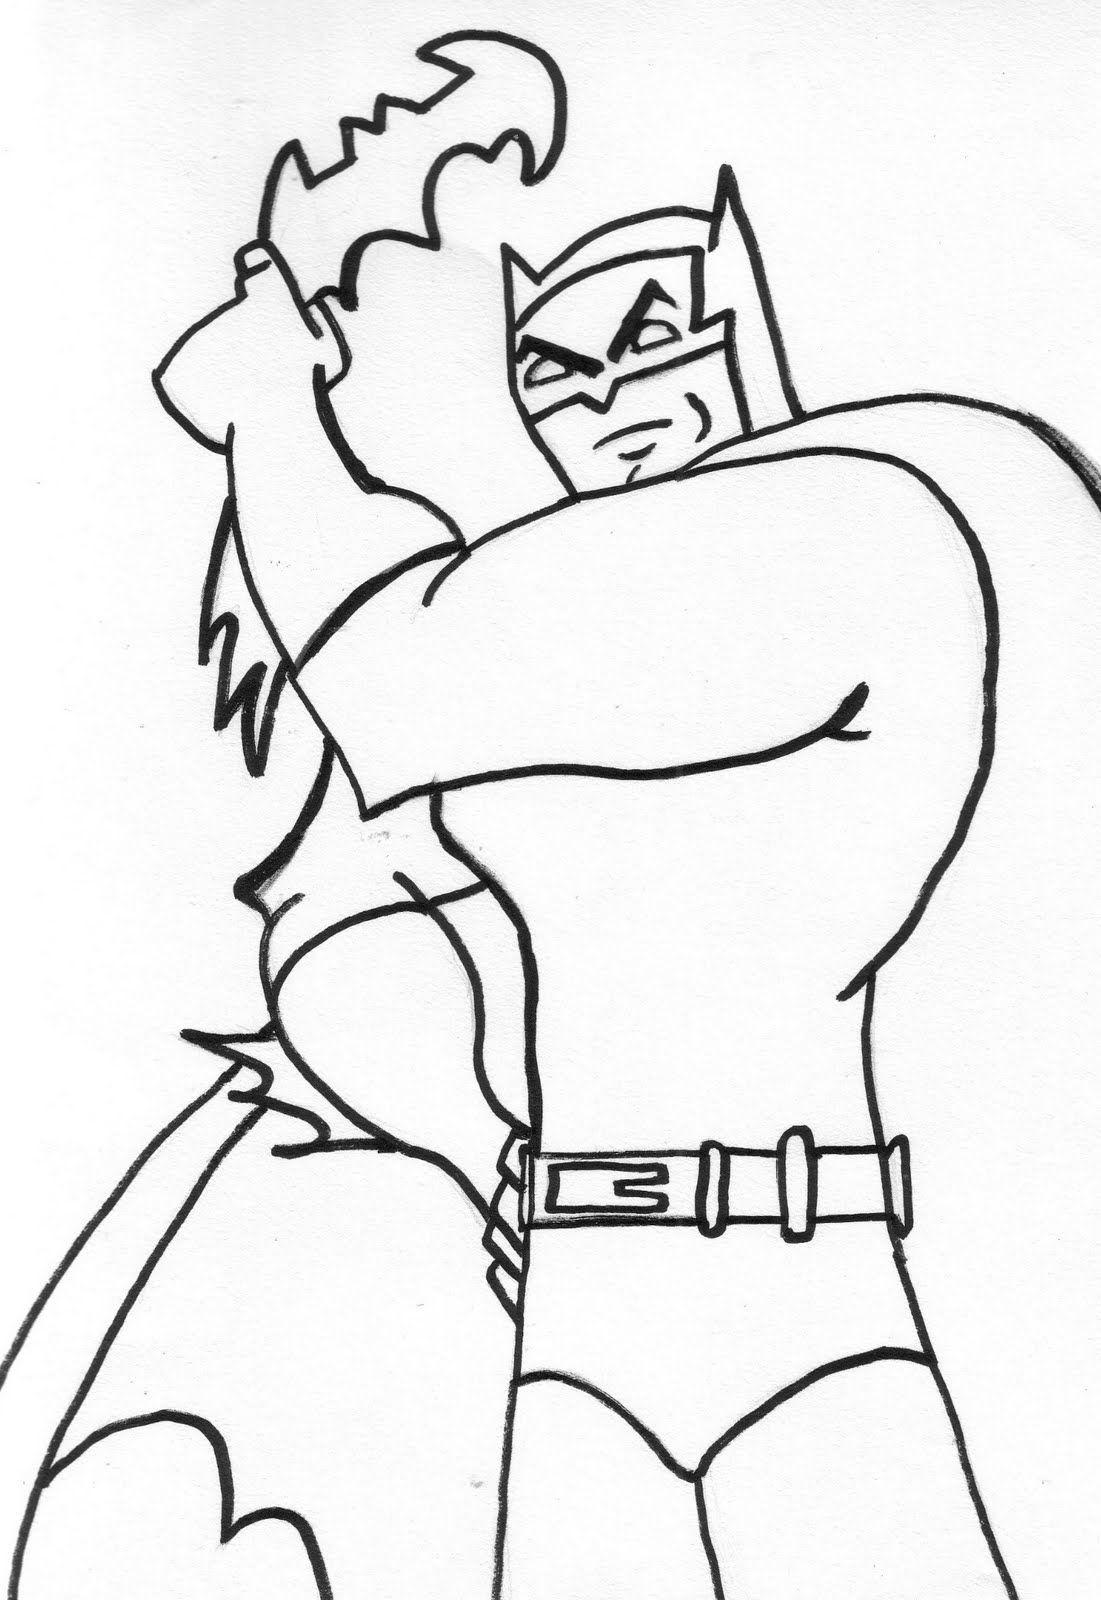 Batman Printable Coloring Pages Cartoon Coloring Pages Batman Coloring Pages Online Coloring Pages